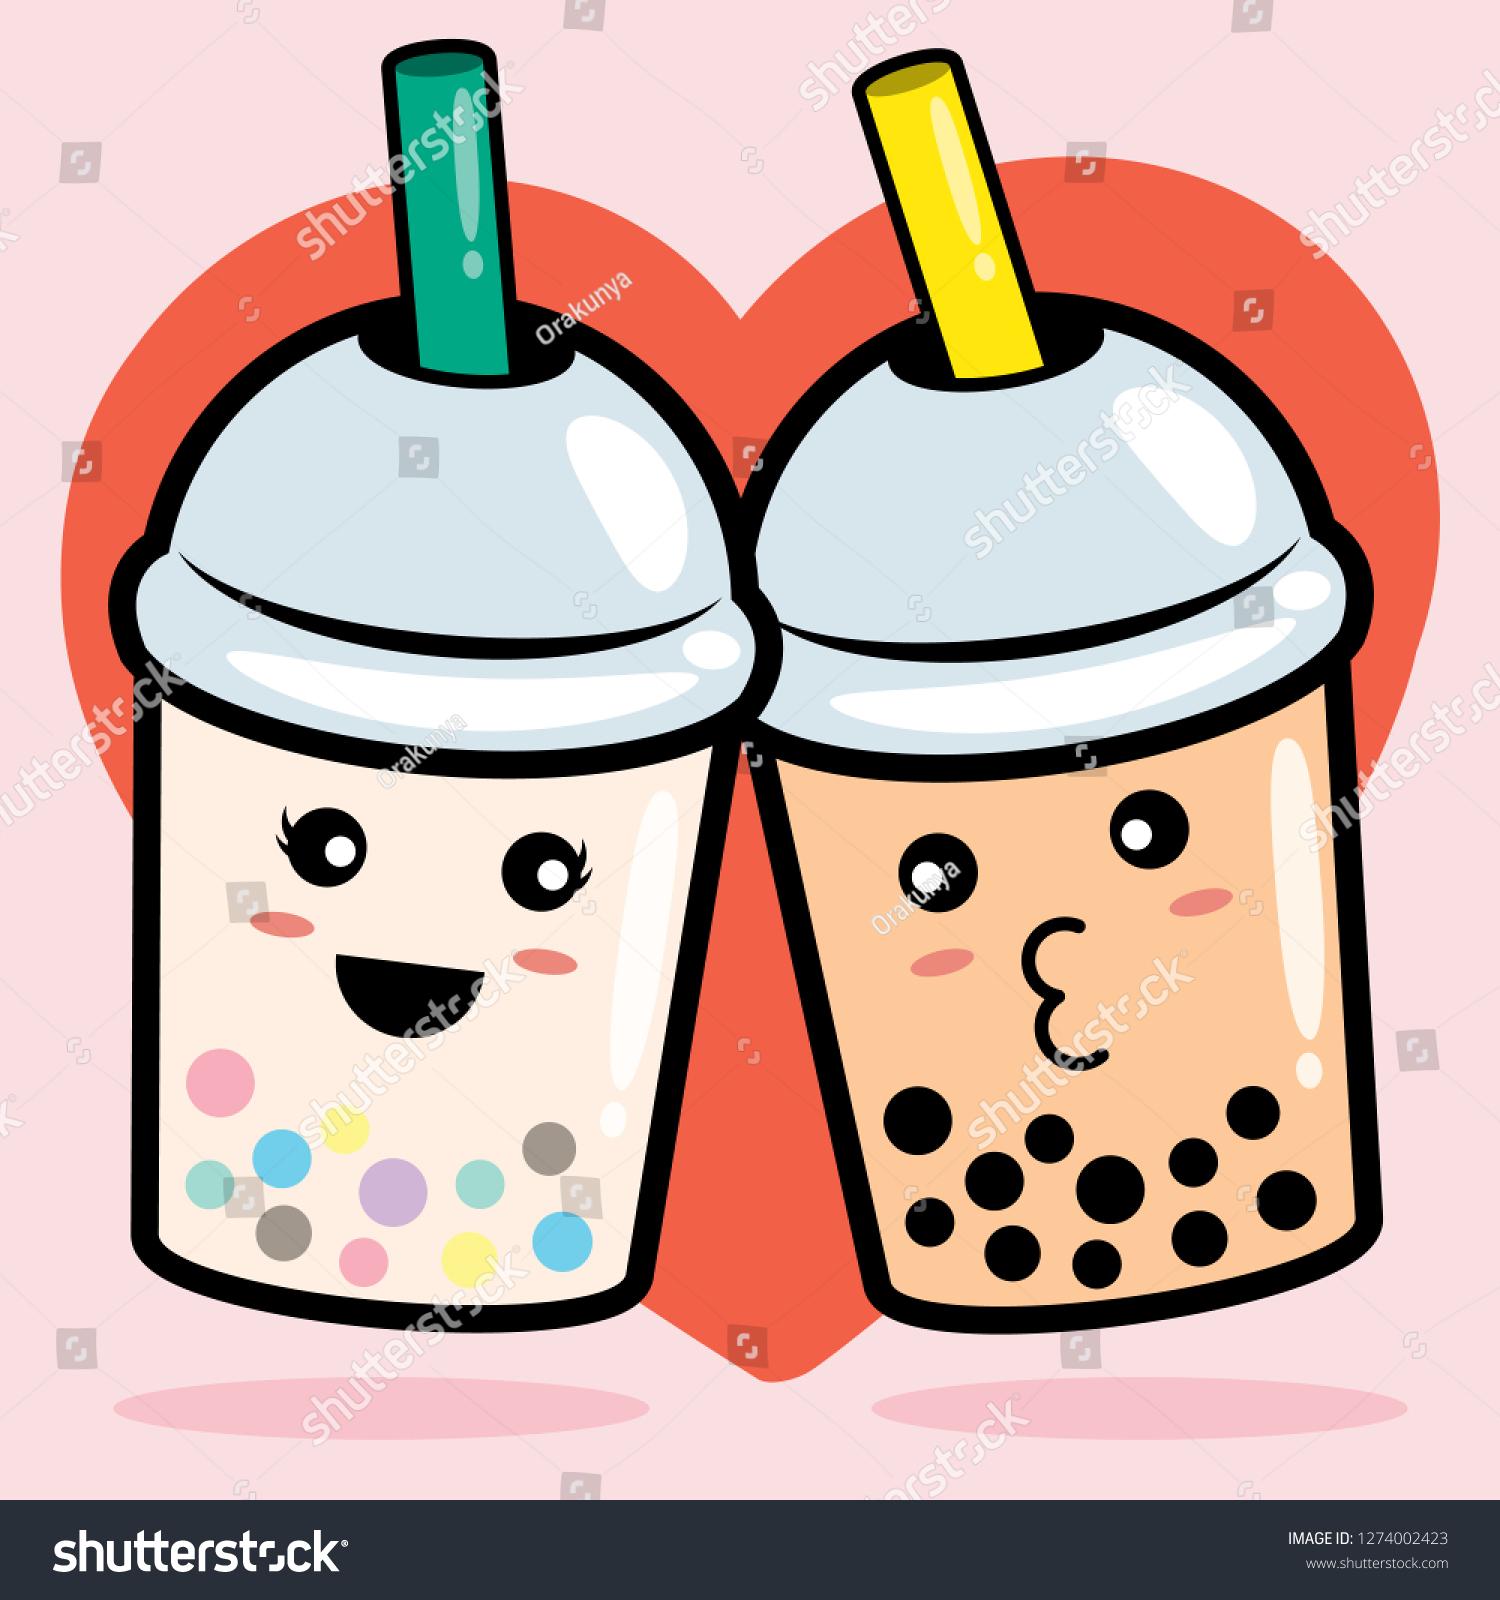 bubble milk tea vector illustration stock vector royalty free 1274002423 https www shutterstock com image vector bubble milk tea vector illustration 1274002423